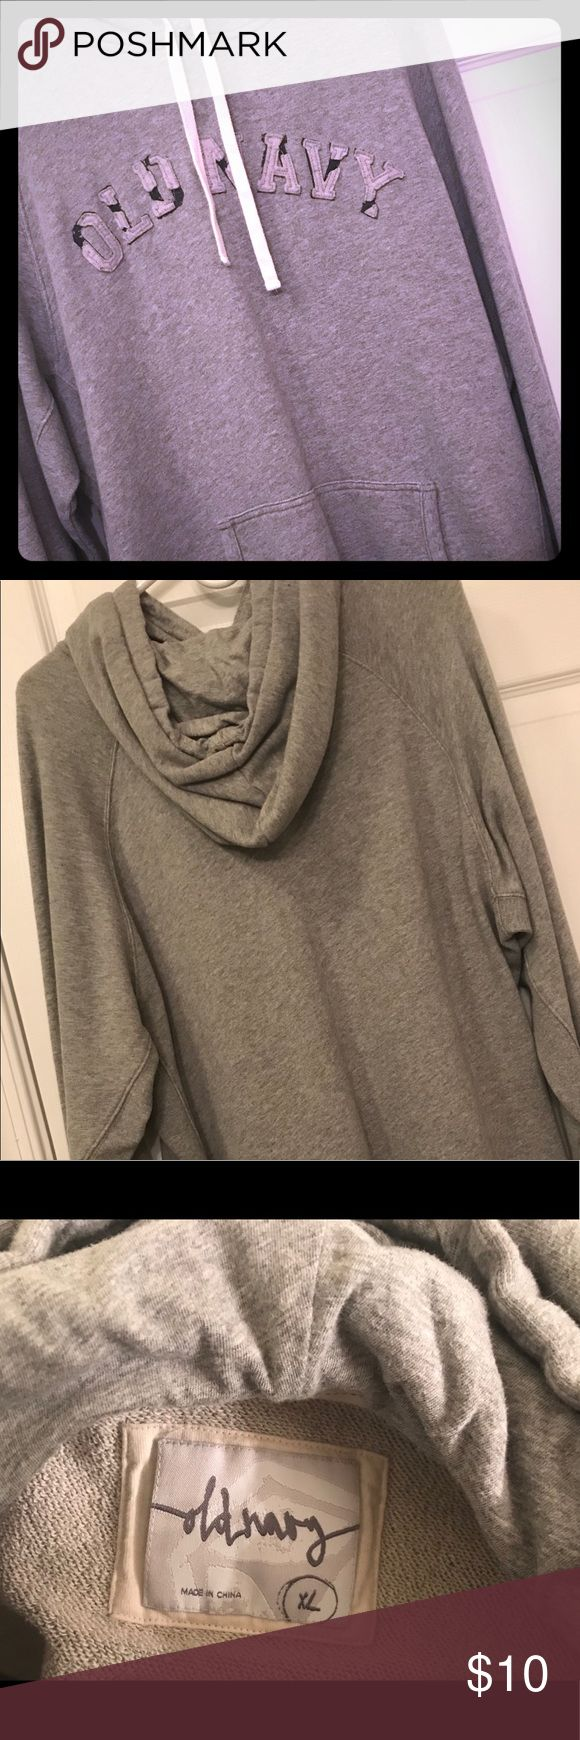 Old Navy hoodie 🛍🛍Like-new Men's Old Navy hoodie ❄️warm, smoke-free home!  No signs of wear or damage! Old Navy Shirts Sweatshirts & Hoodies